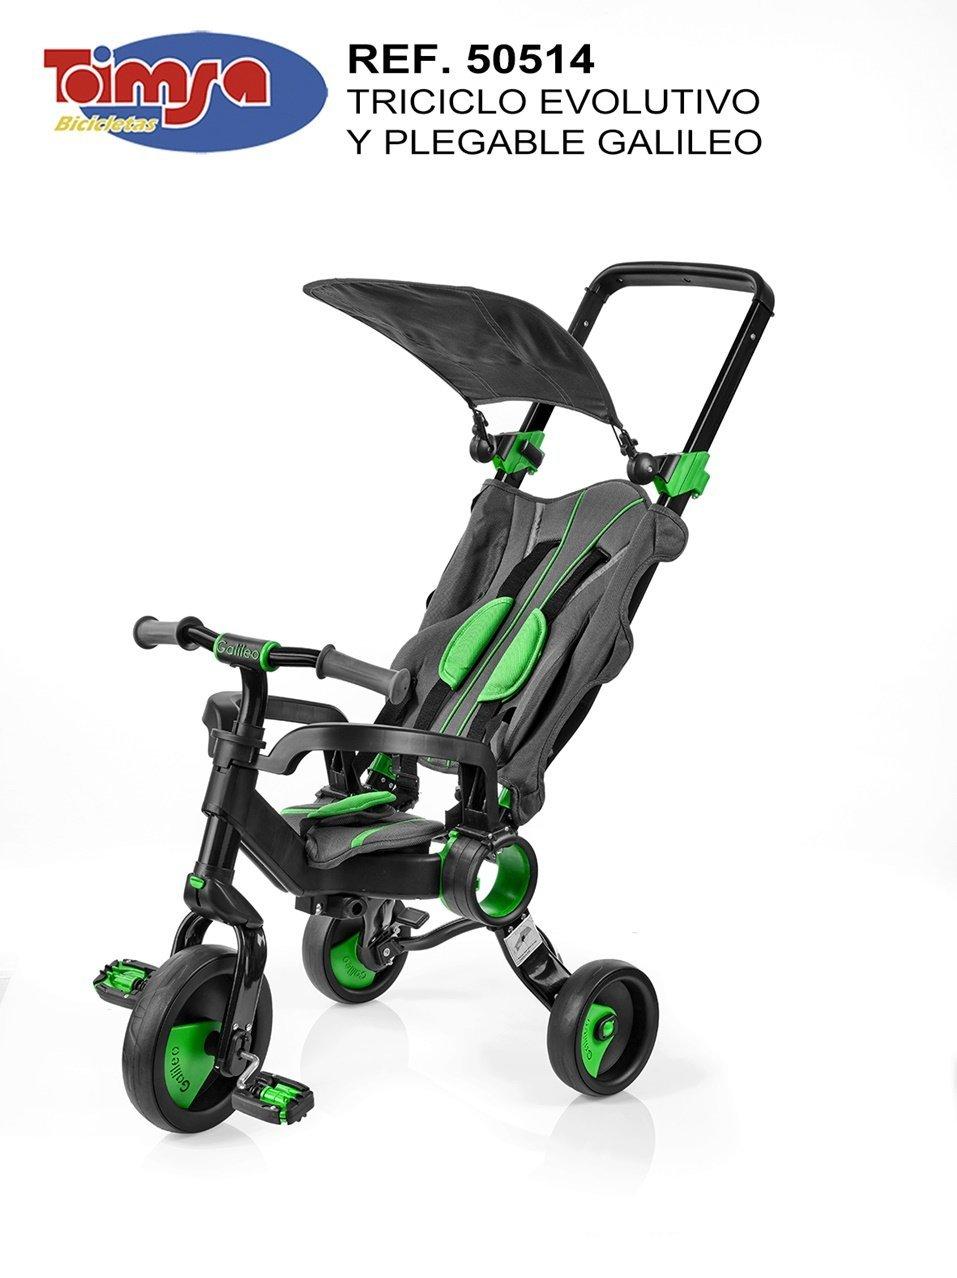 Toim Triciclo Galileo Plegable Negro Y Verde 65X45X1,05 CM Plegado 70X45X25 CM, (50514)